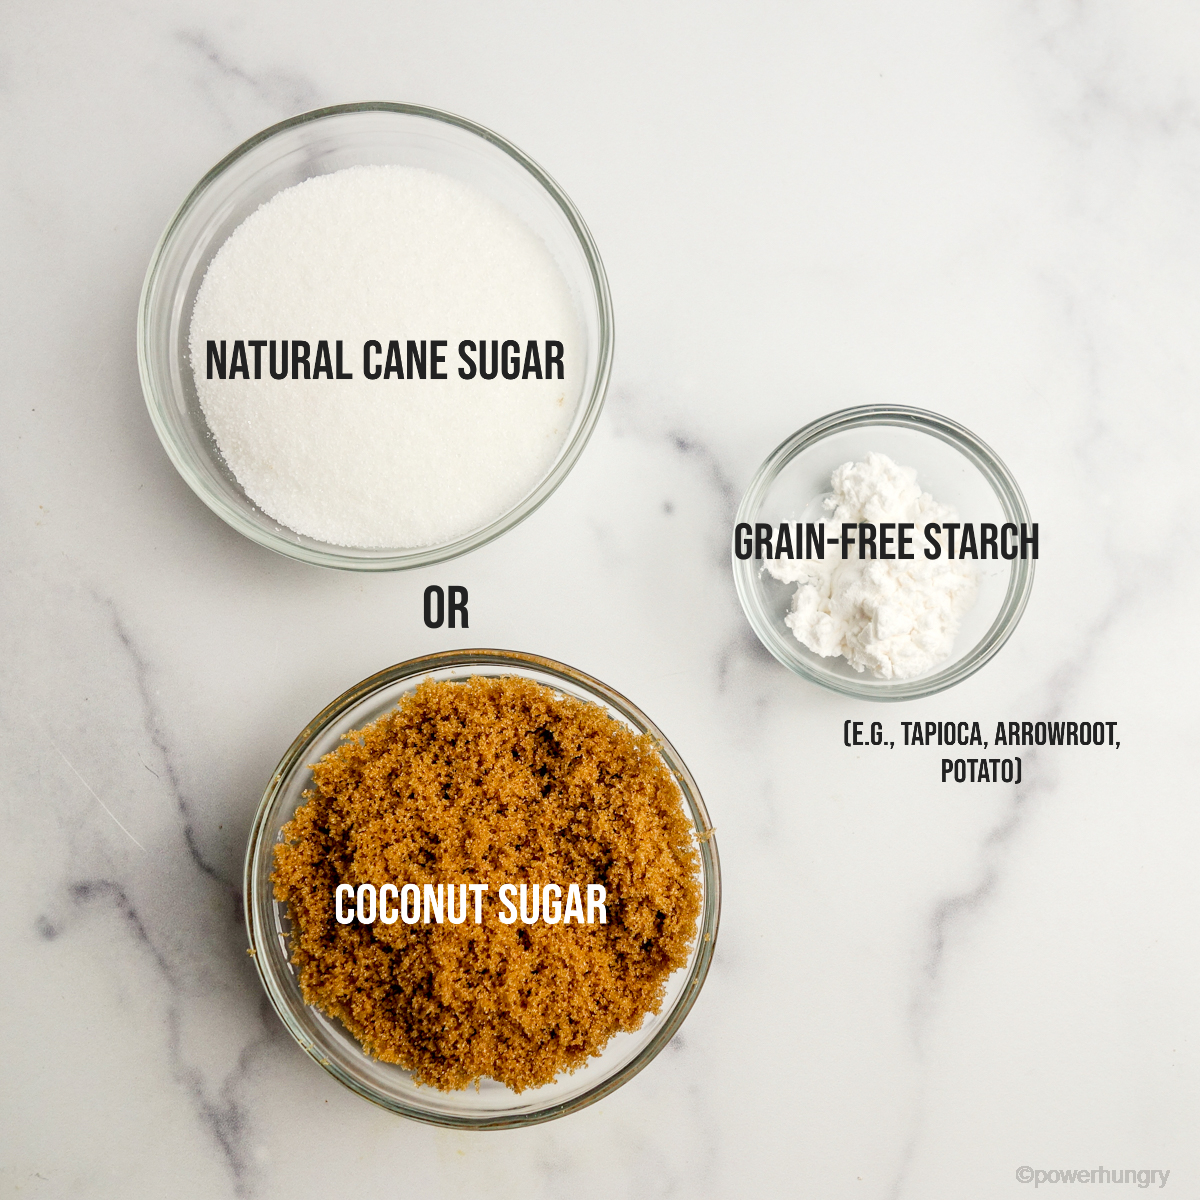 overhead shot of ingredients for diy grain-free powdered sugar